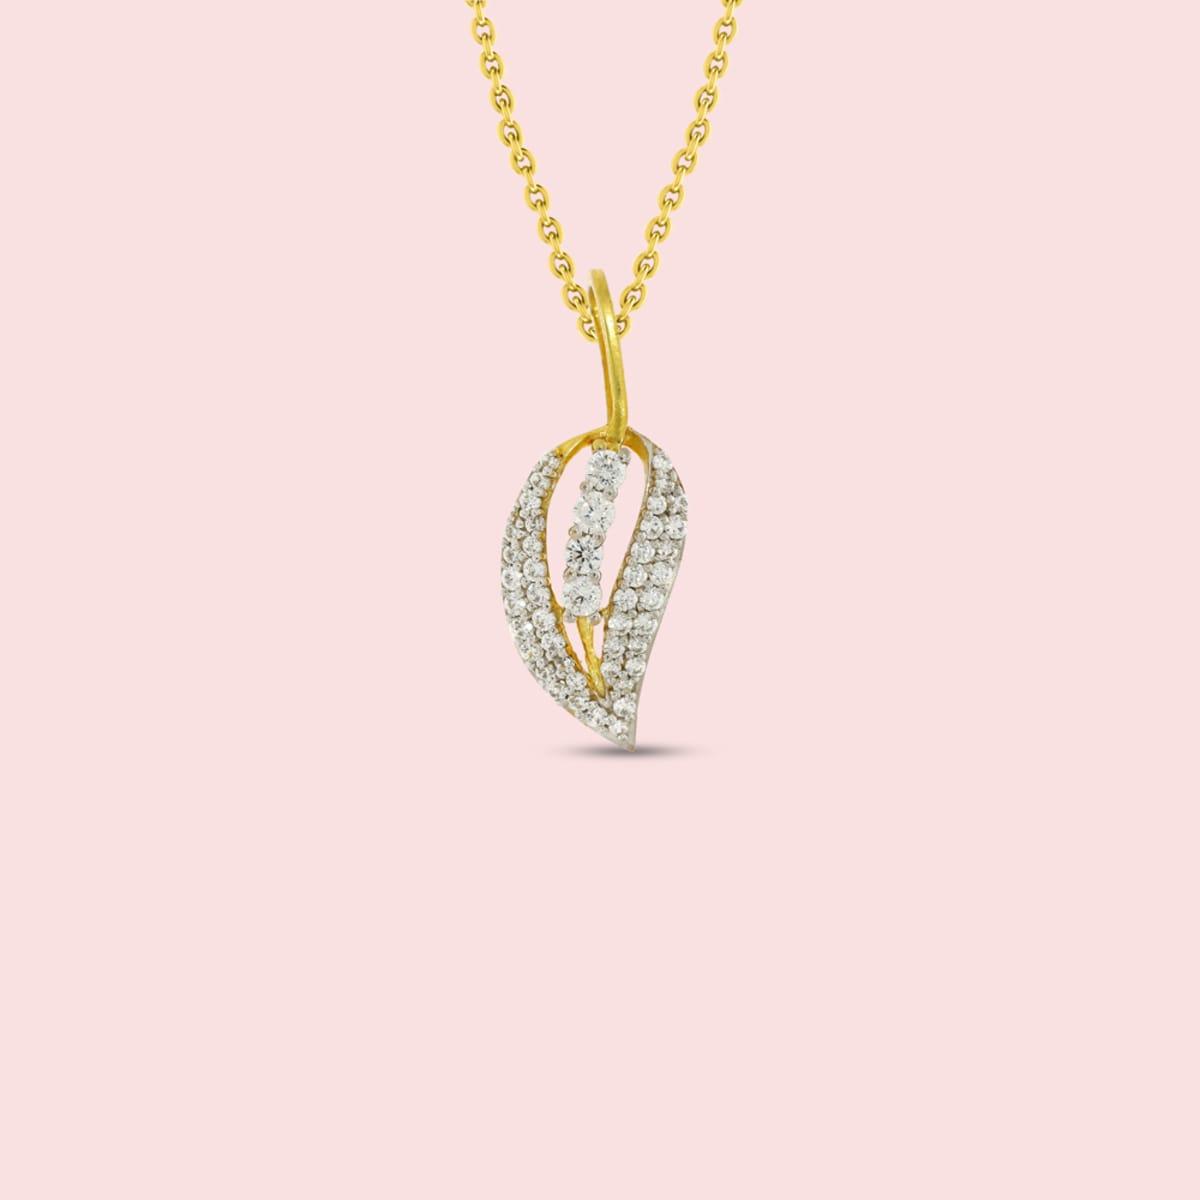 18kt Yellow Gold Leaf Shape Real Diamond Pendant